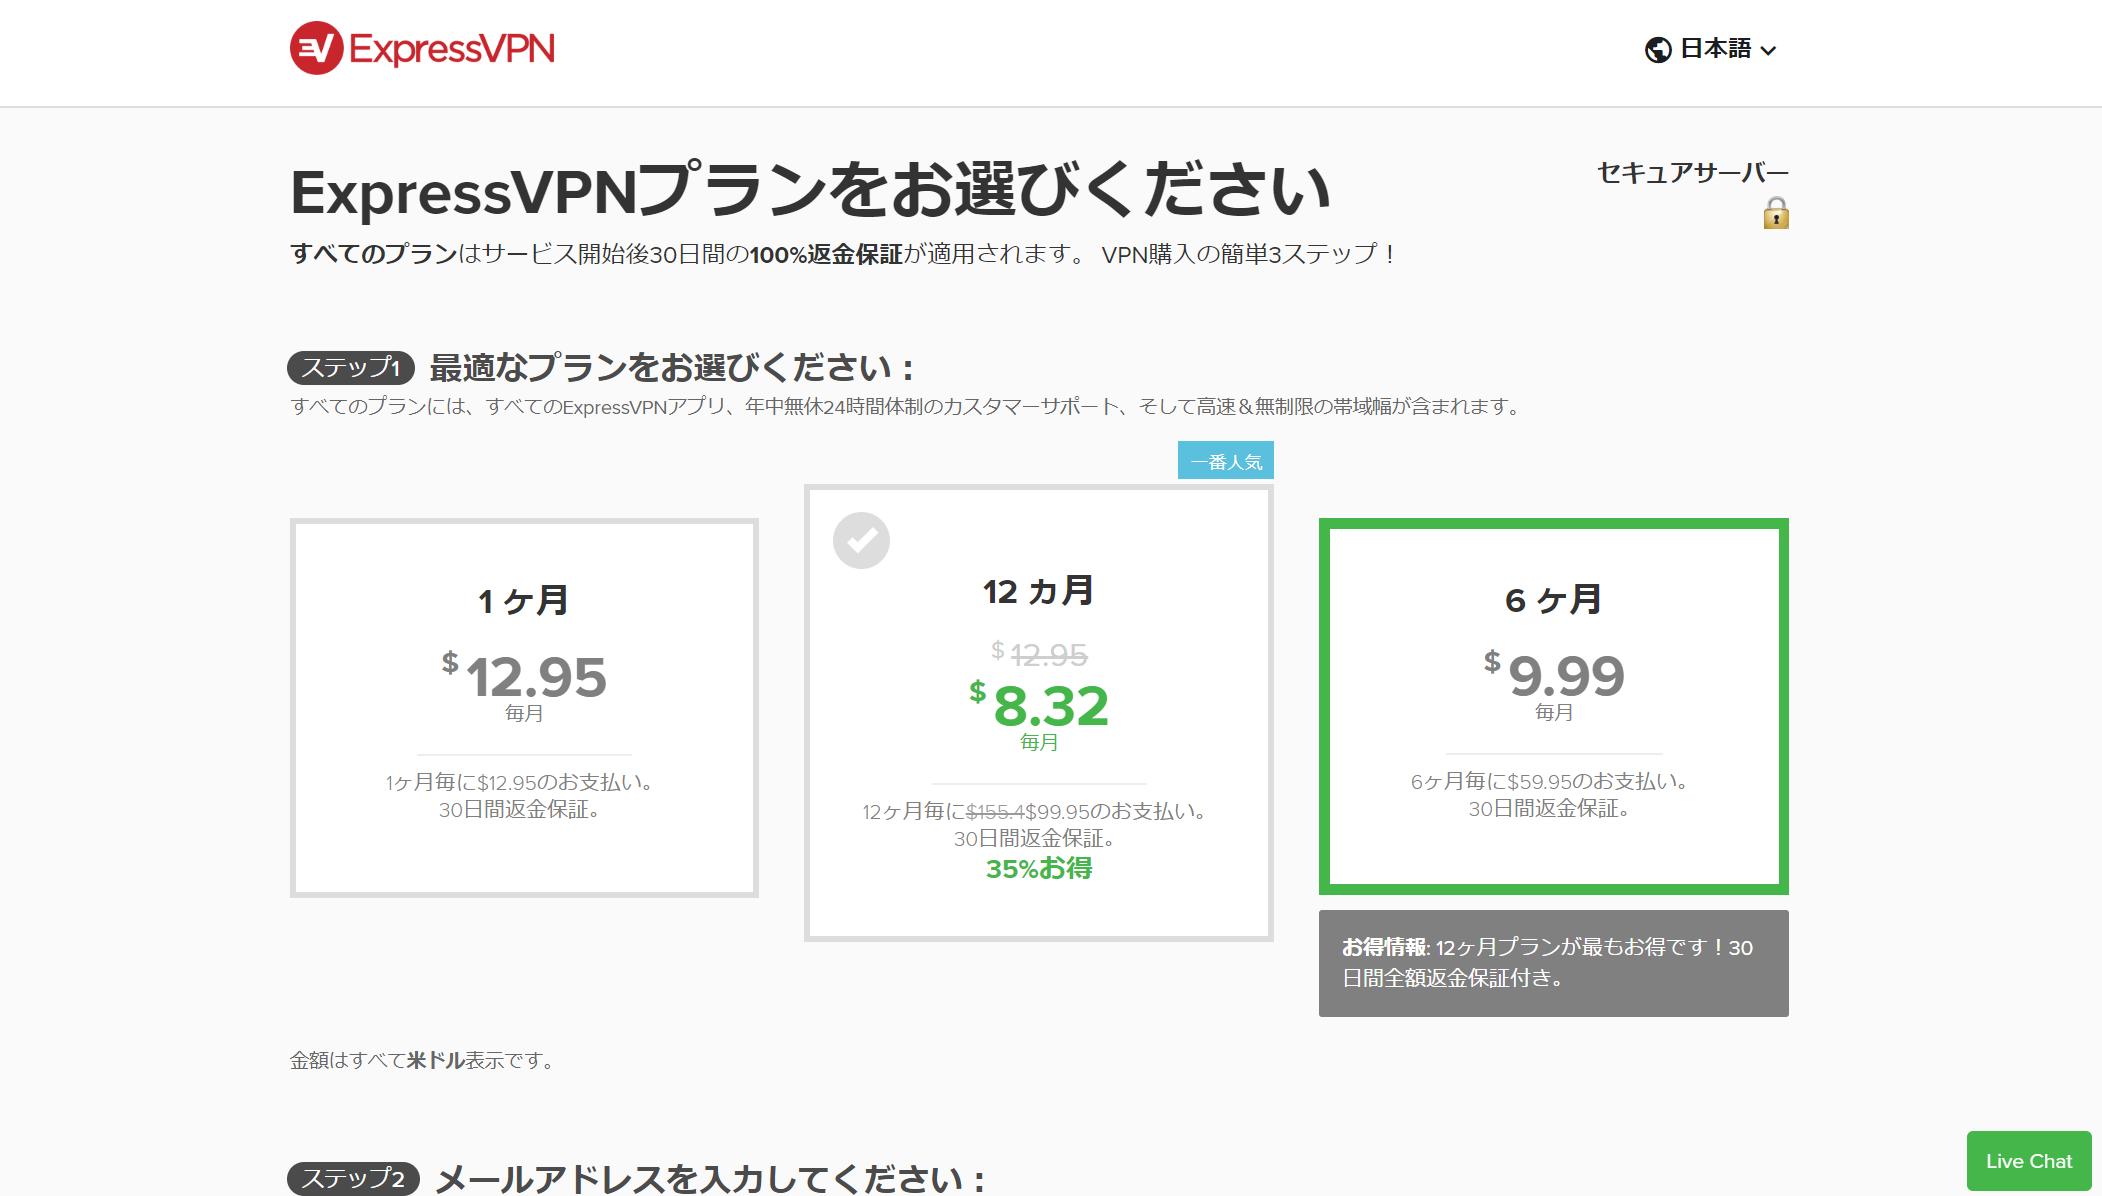 expressVPNの支払い画面